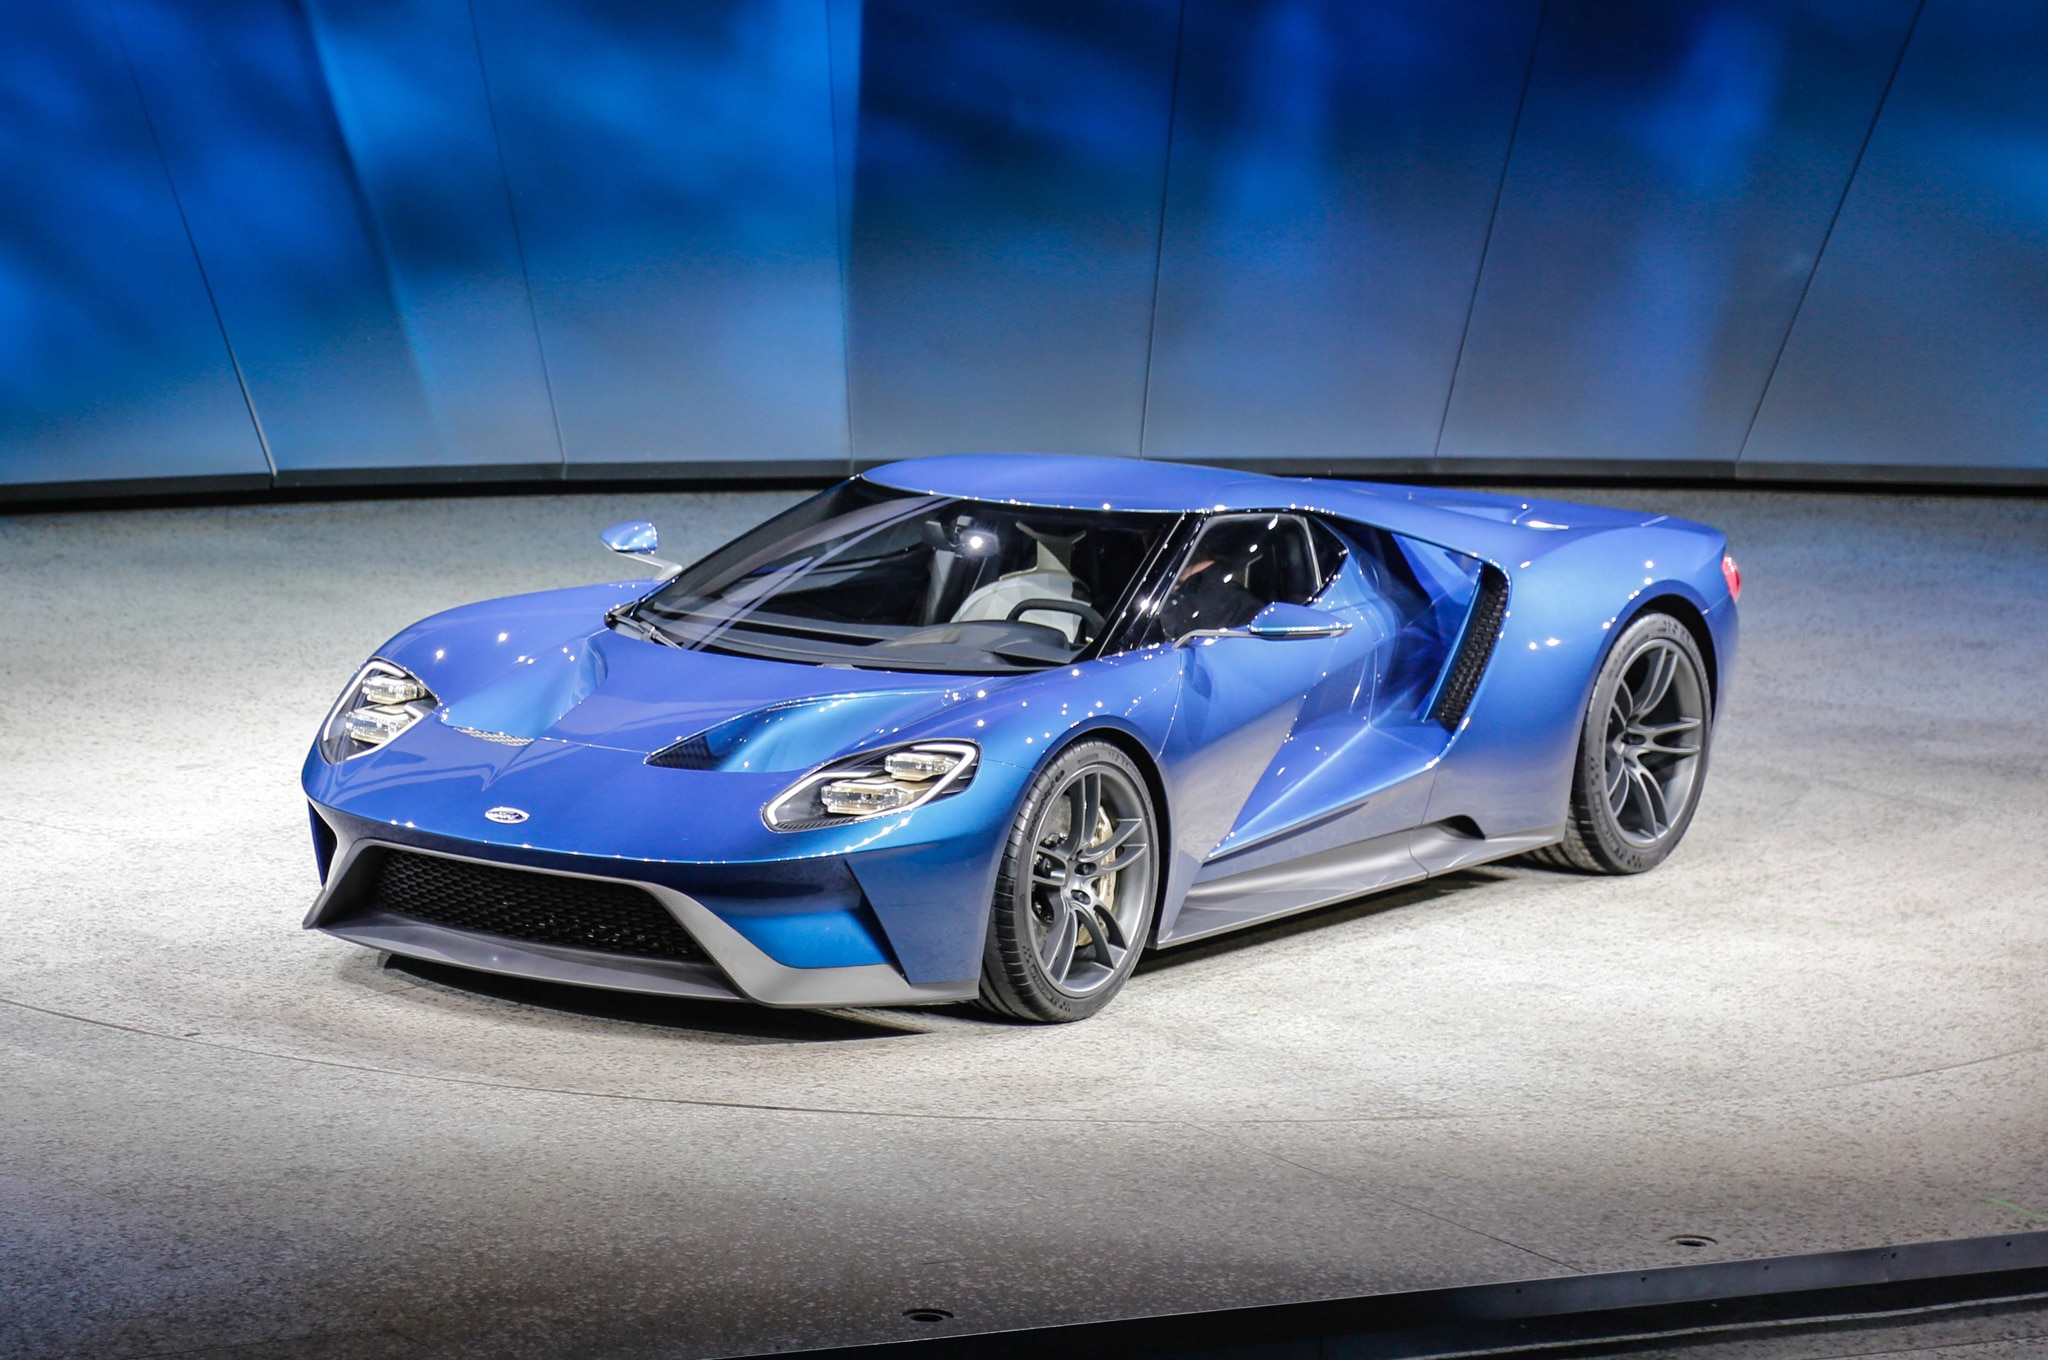 Carbon Fiber 600 Horsepower 2017 Ford Gt: Supercar Face-Off: Ford GT Vs. Acura NSX